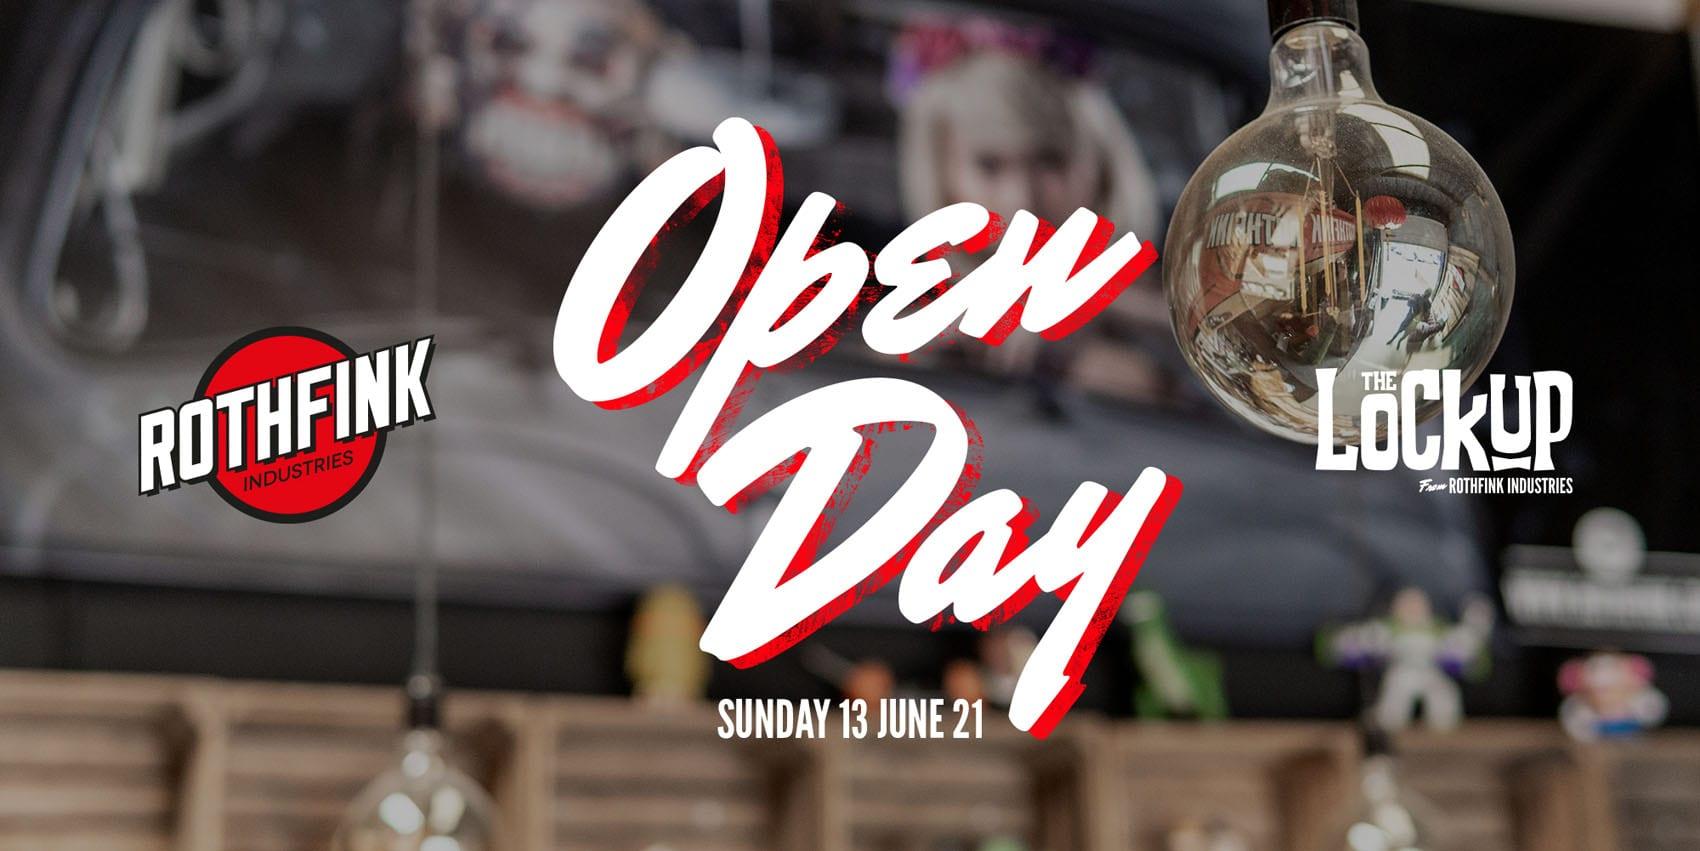 Rothfink Open Day – 13 June 2021